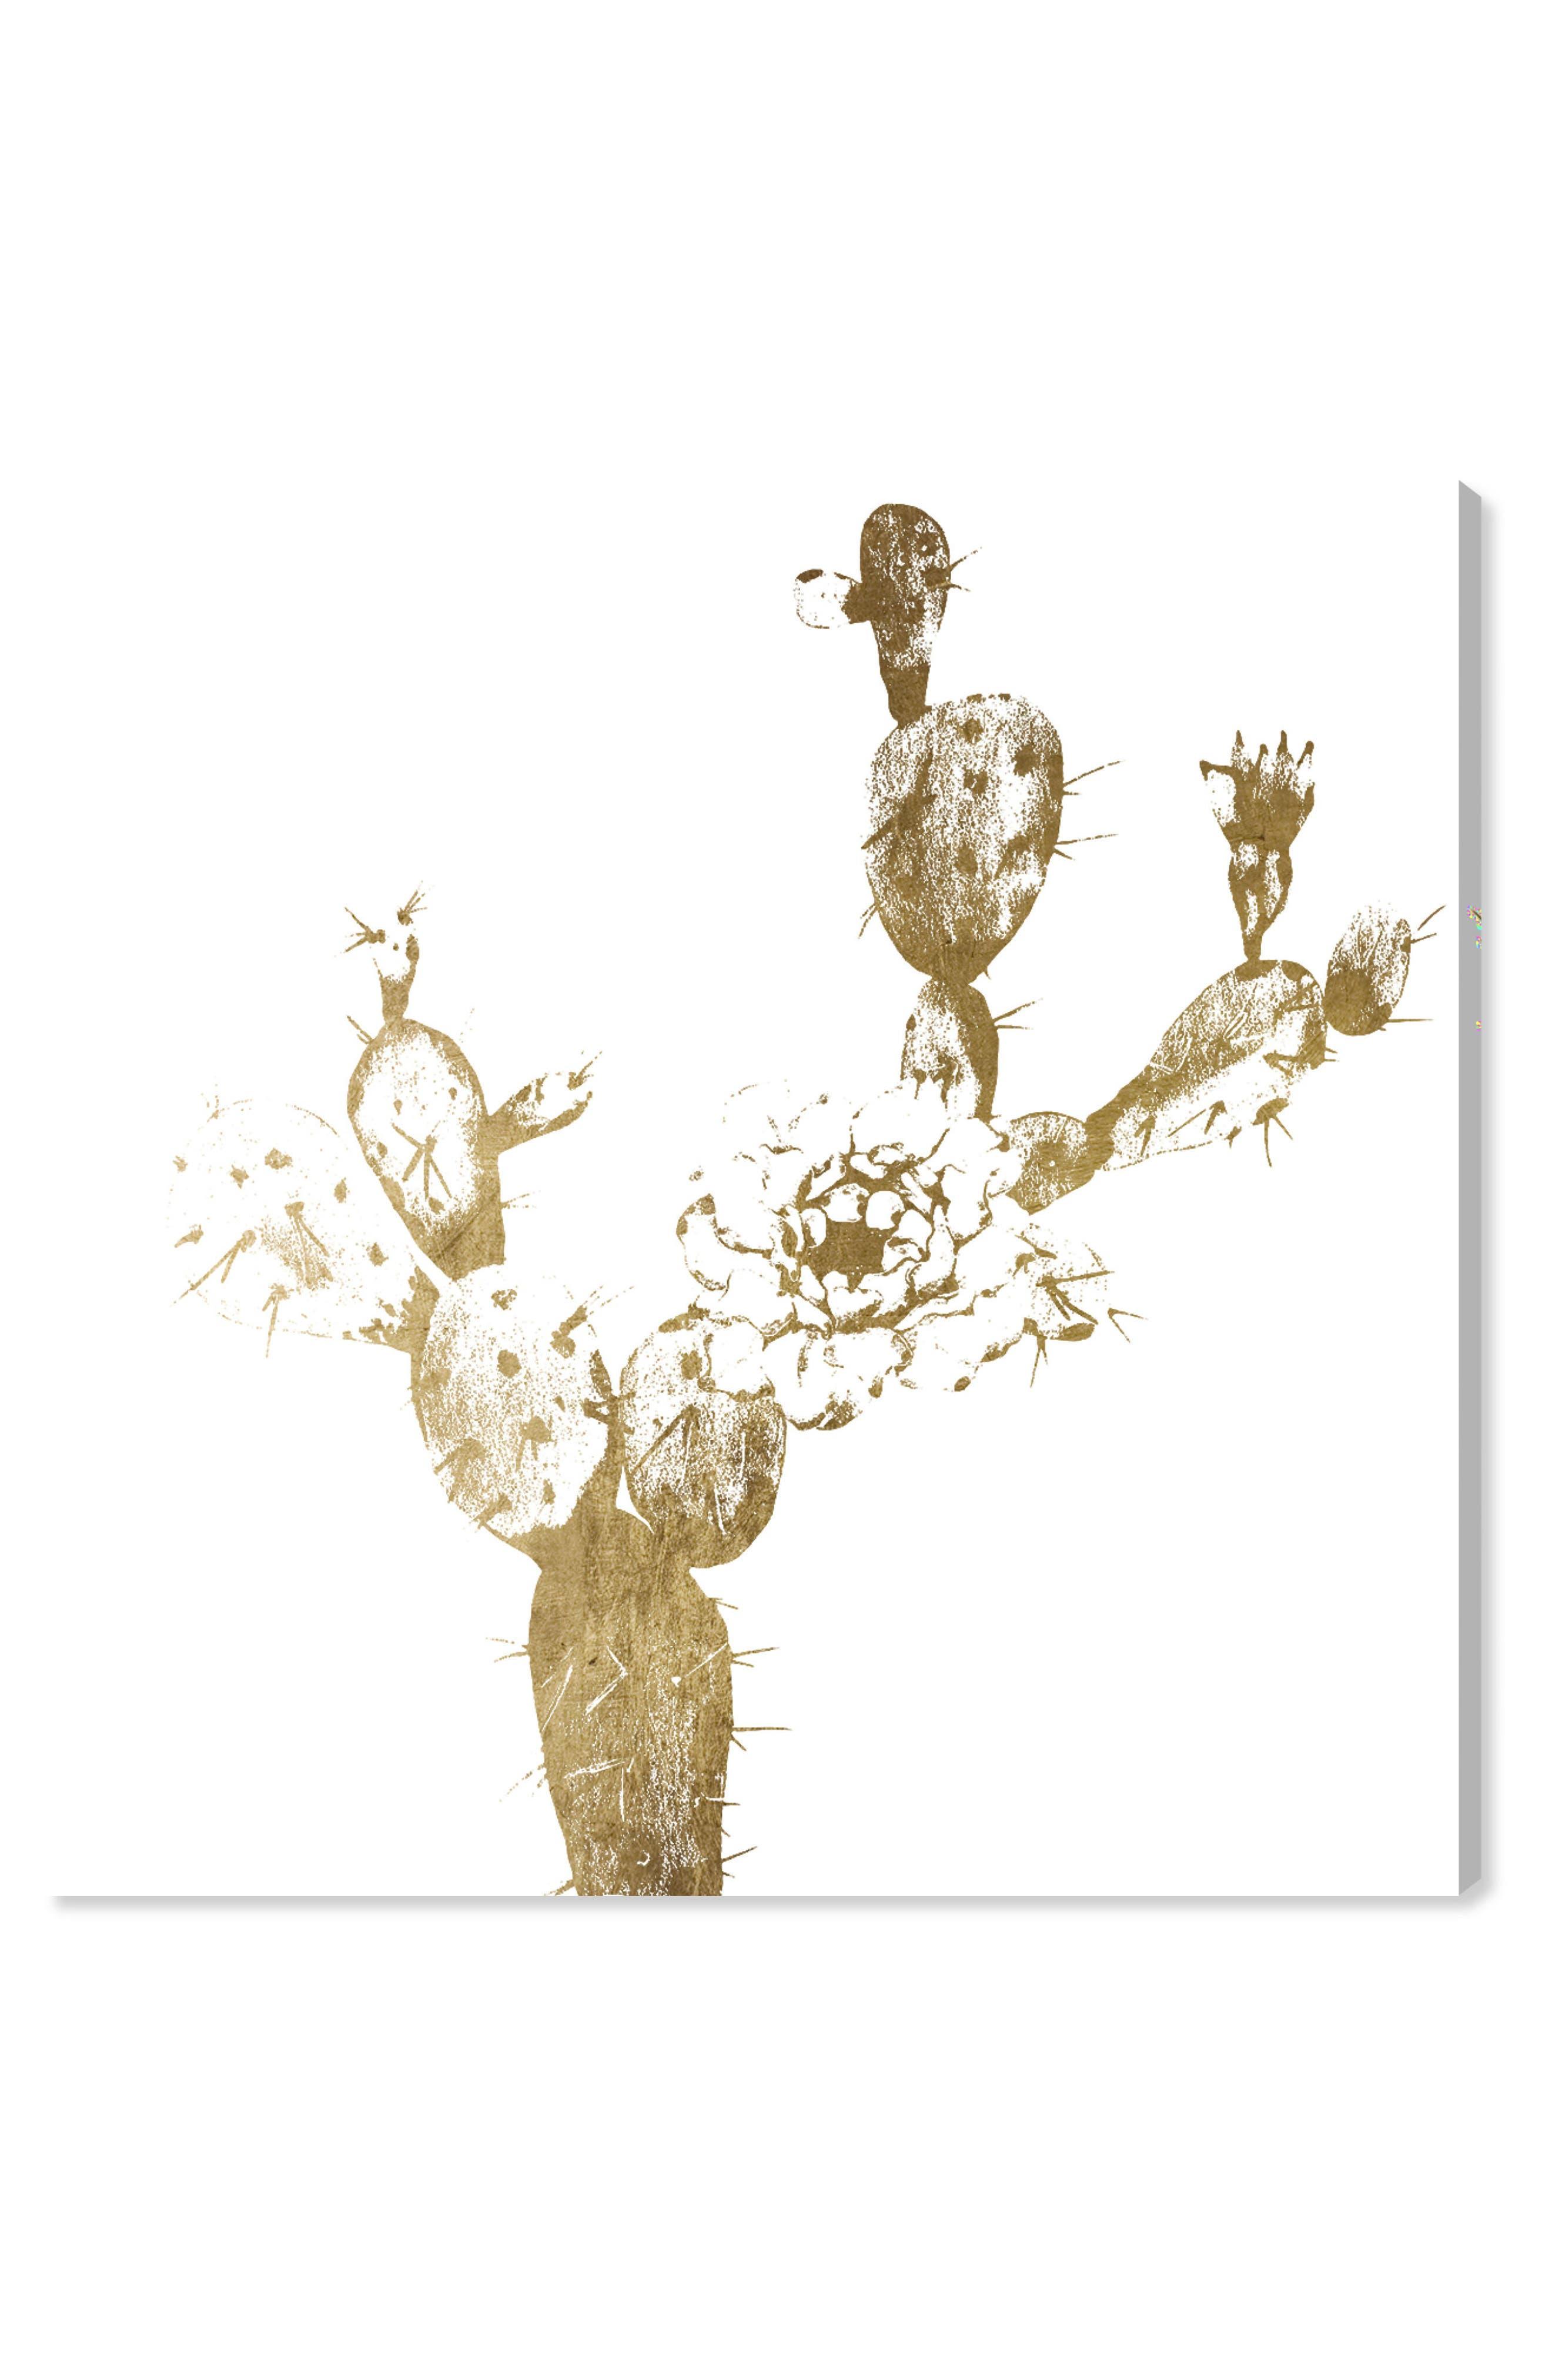 Main Image - Oliver Gal Cactus Gold I Canvas Wall Art